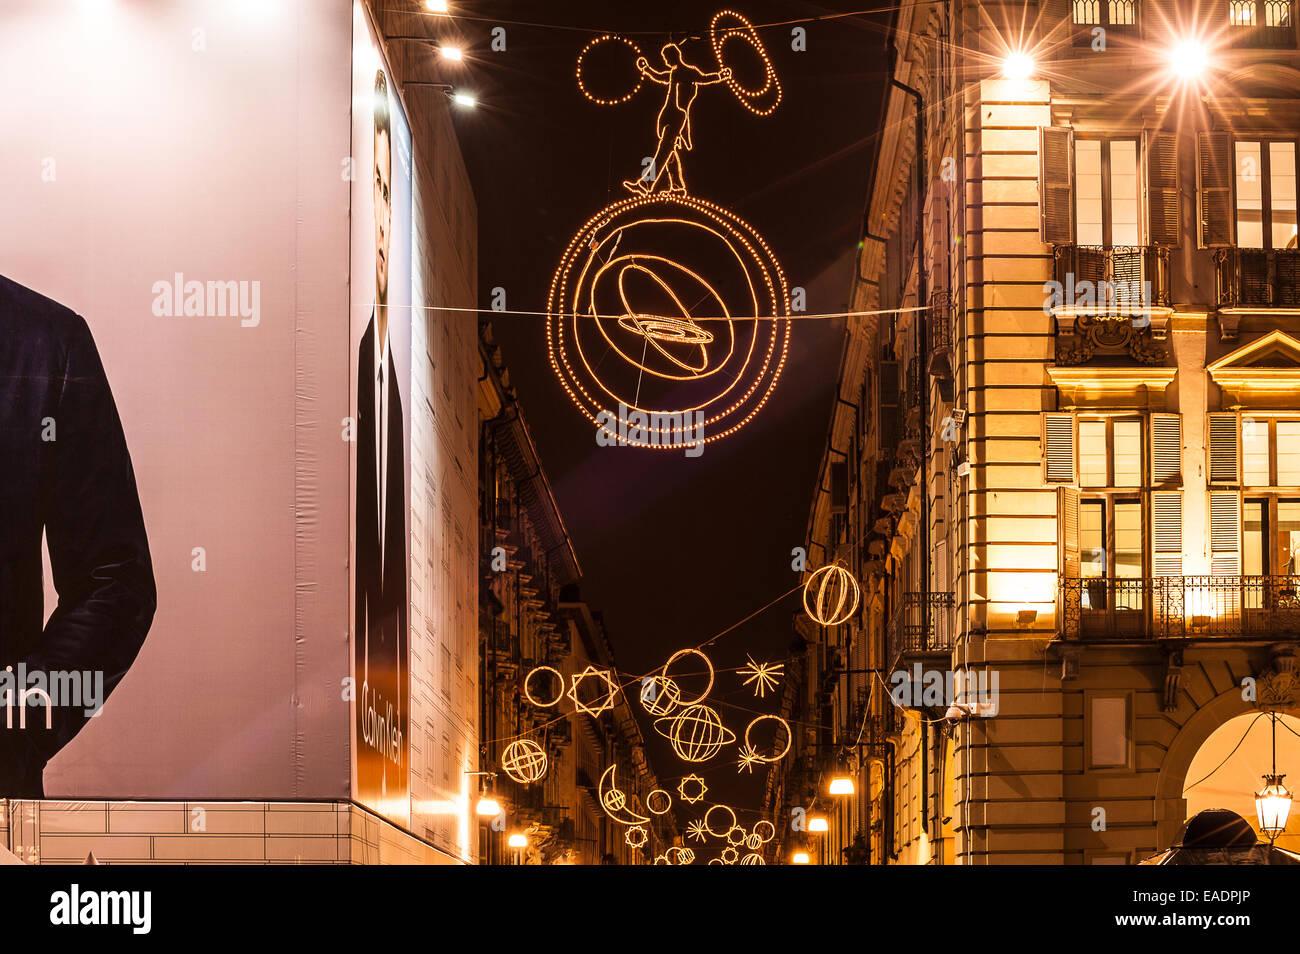 "Turin, Italy. 12th Nov, 2014. Italy Piedmont Turin "" Luci d'Artista"" in Via Garibaldi - Palomar - By Giulio Paolini Stock Photo"